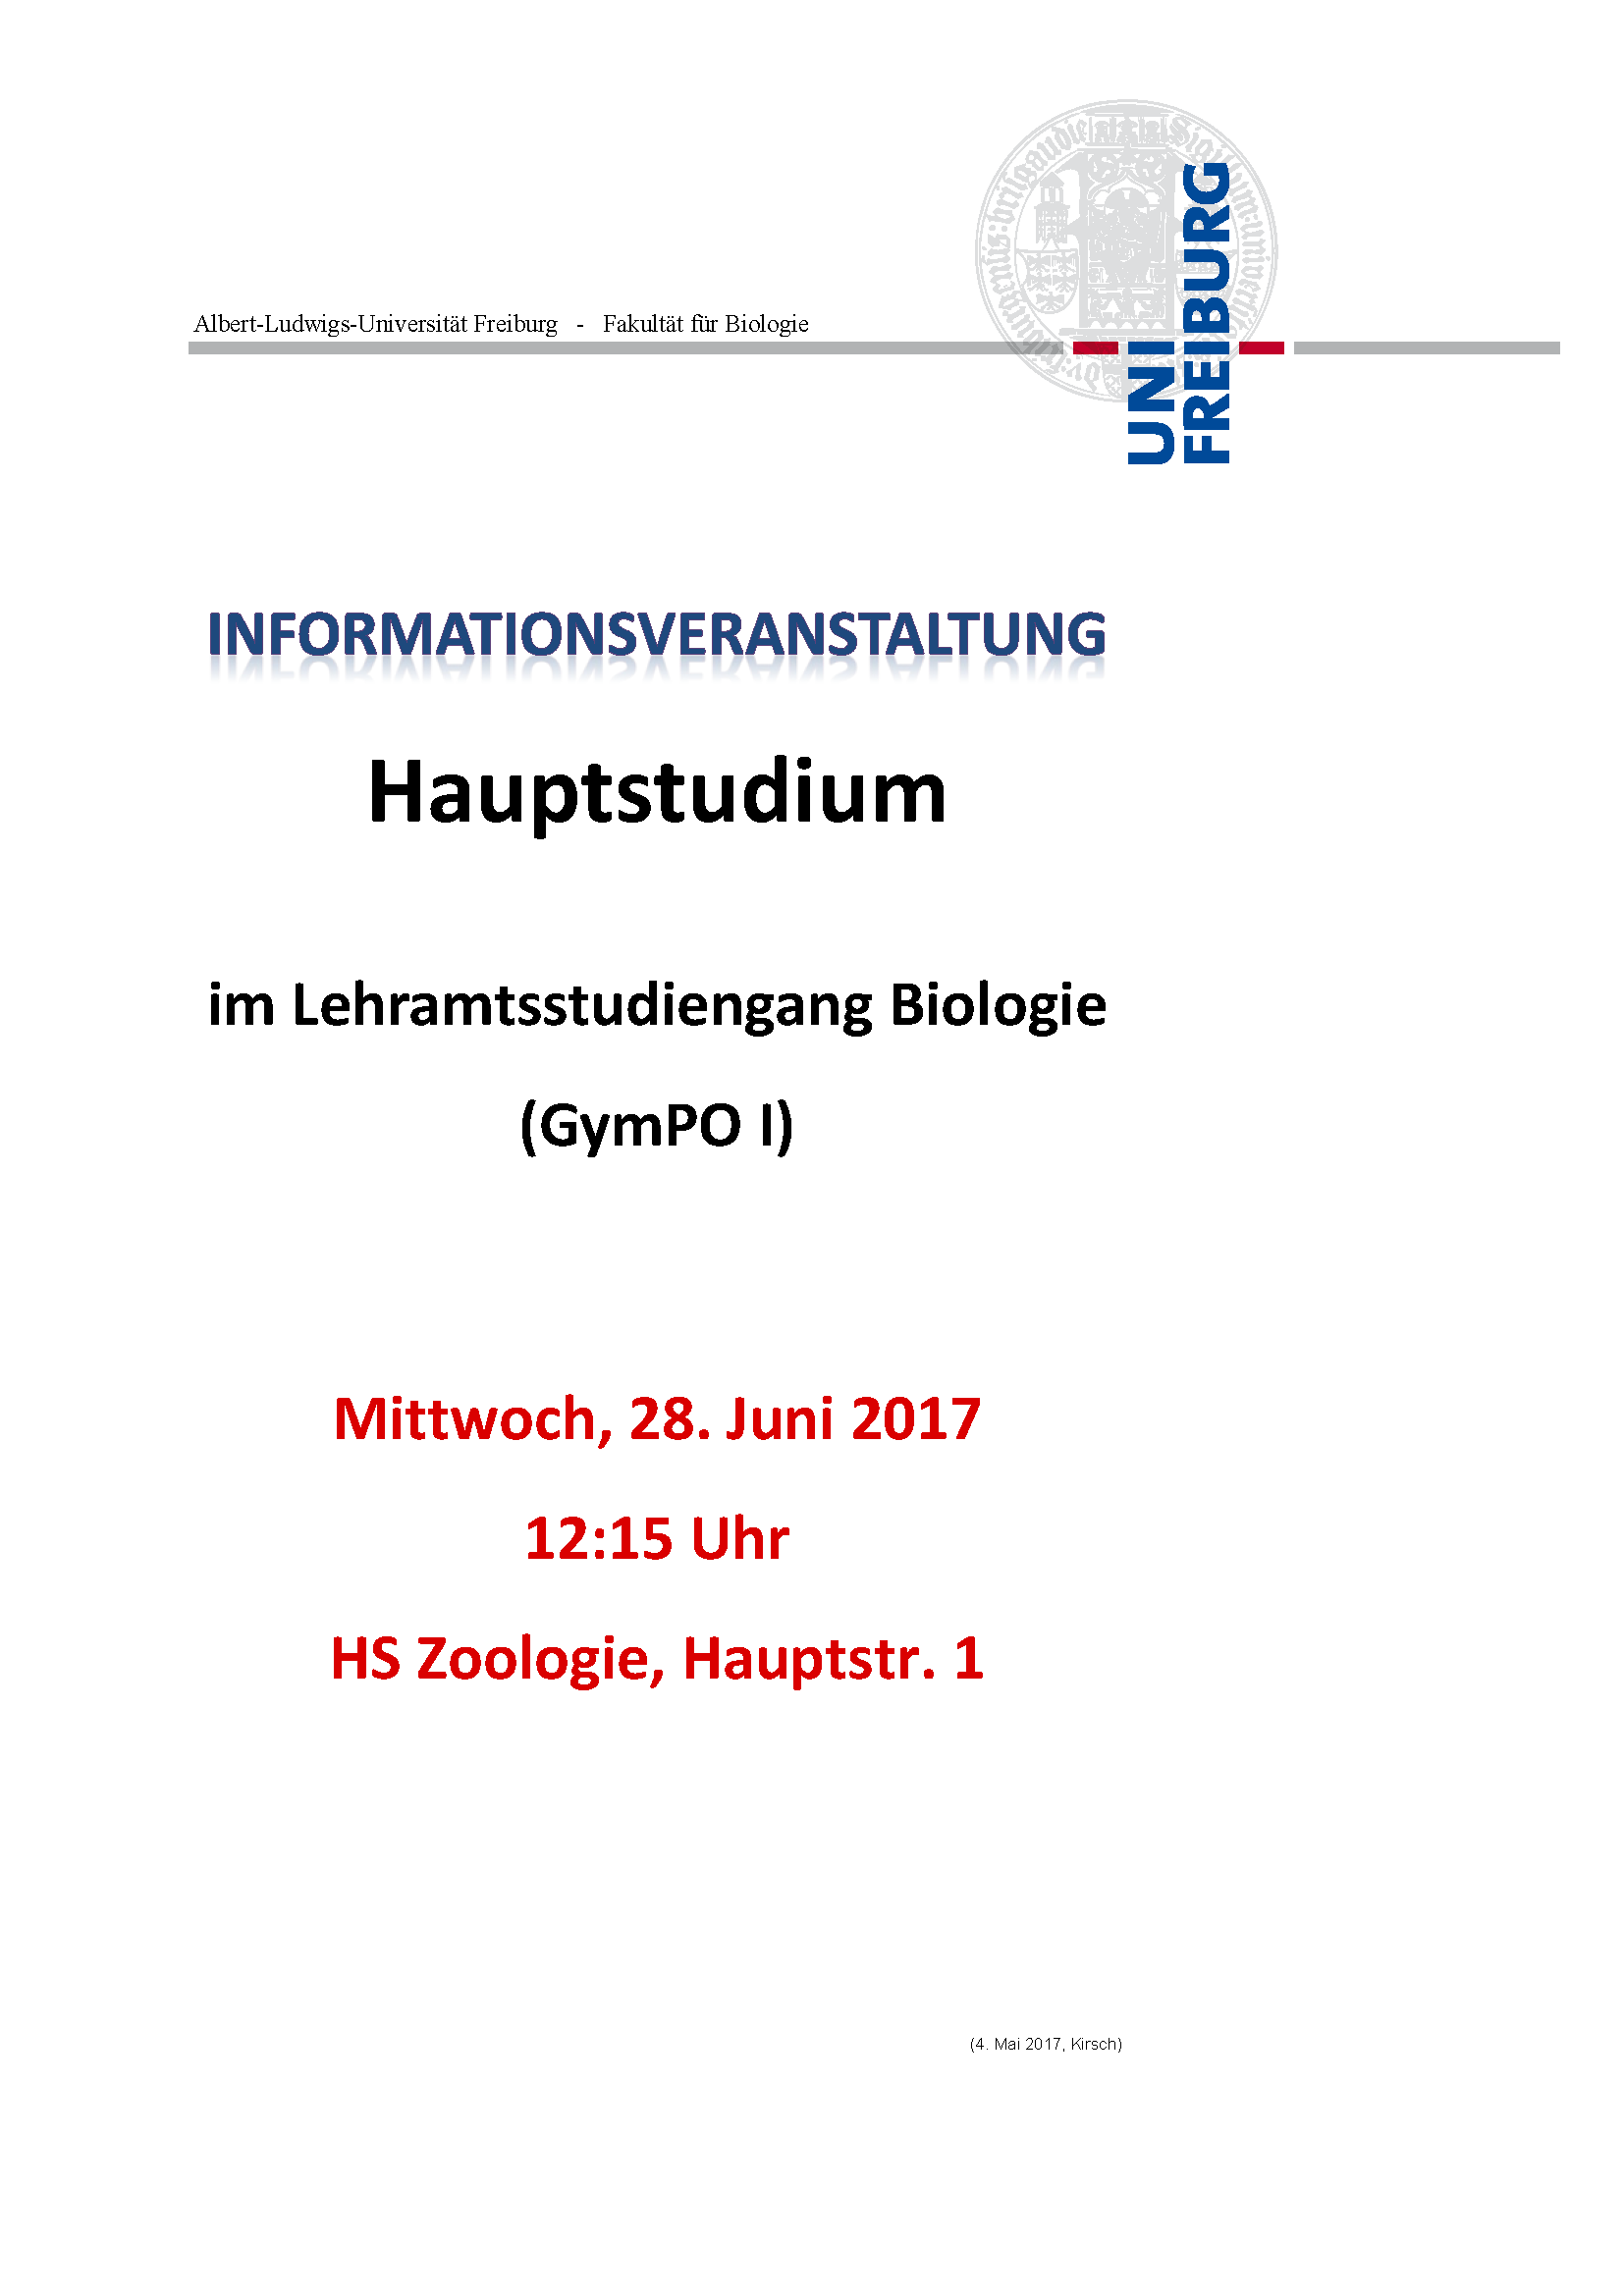 aushang_hauptstudium-la_2017.png